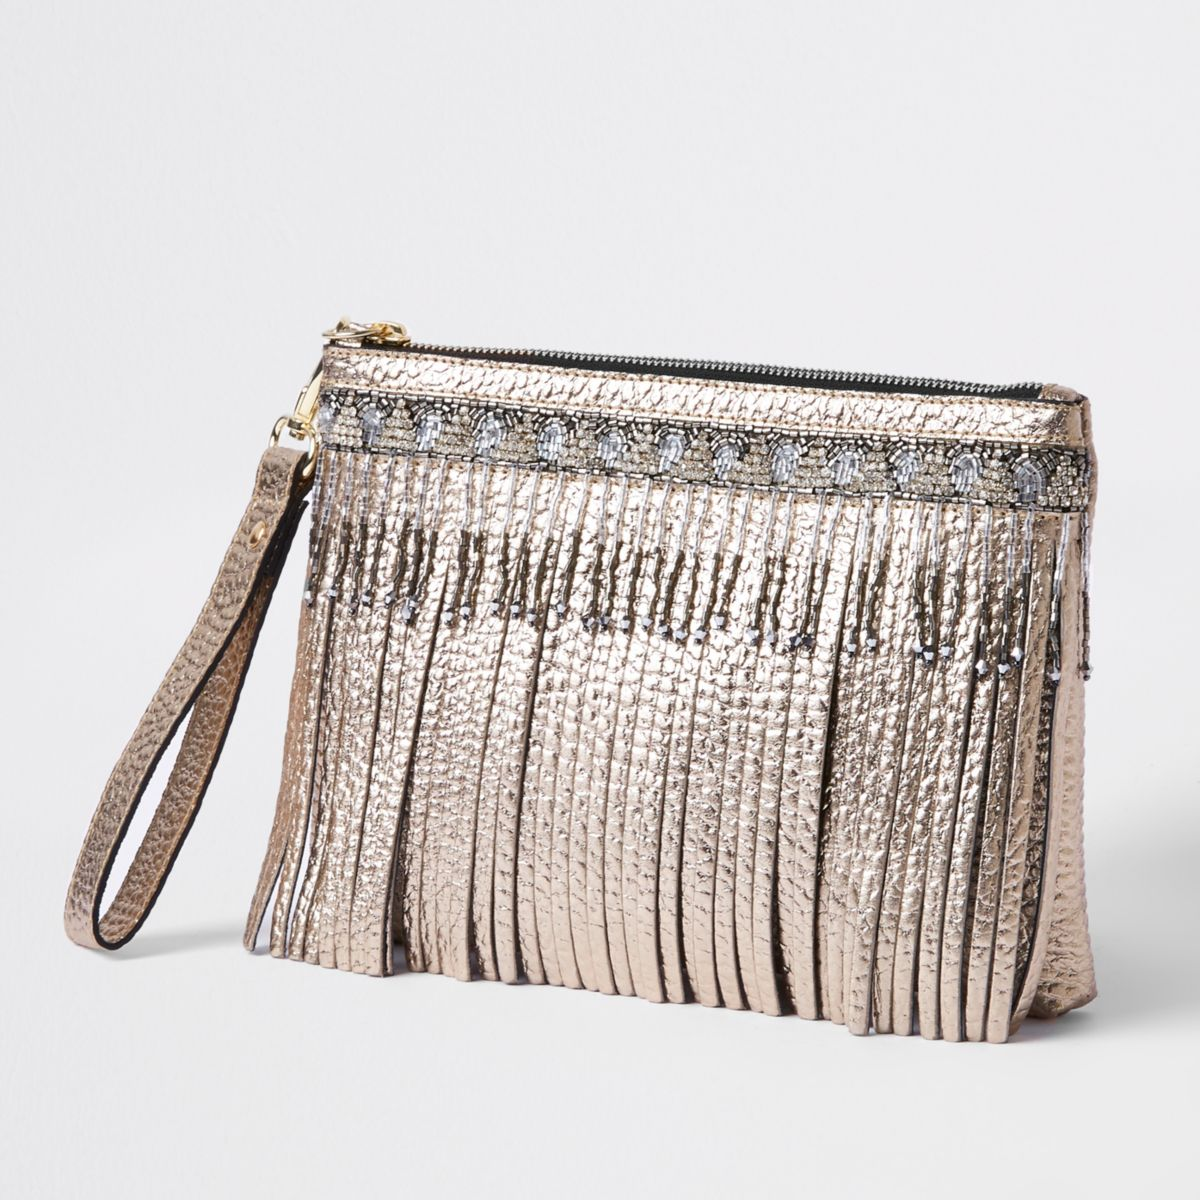 Gold metallic leather fringe clutch bag